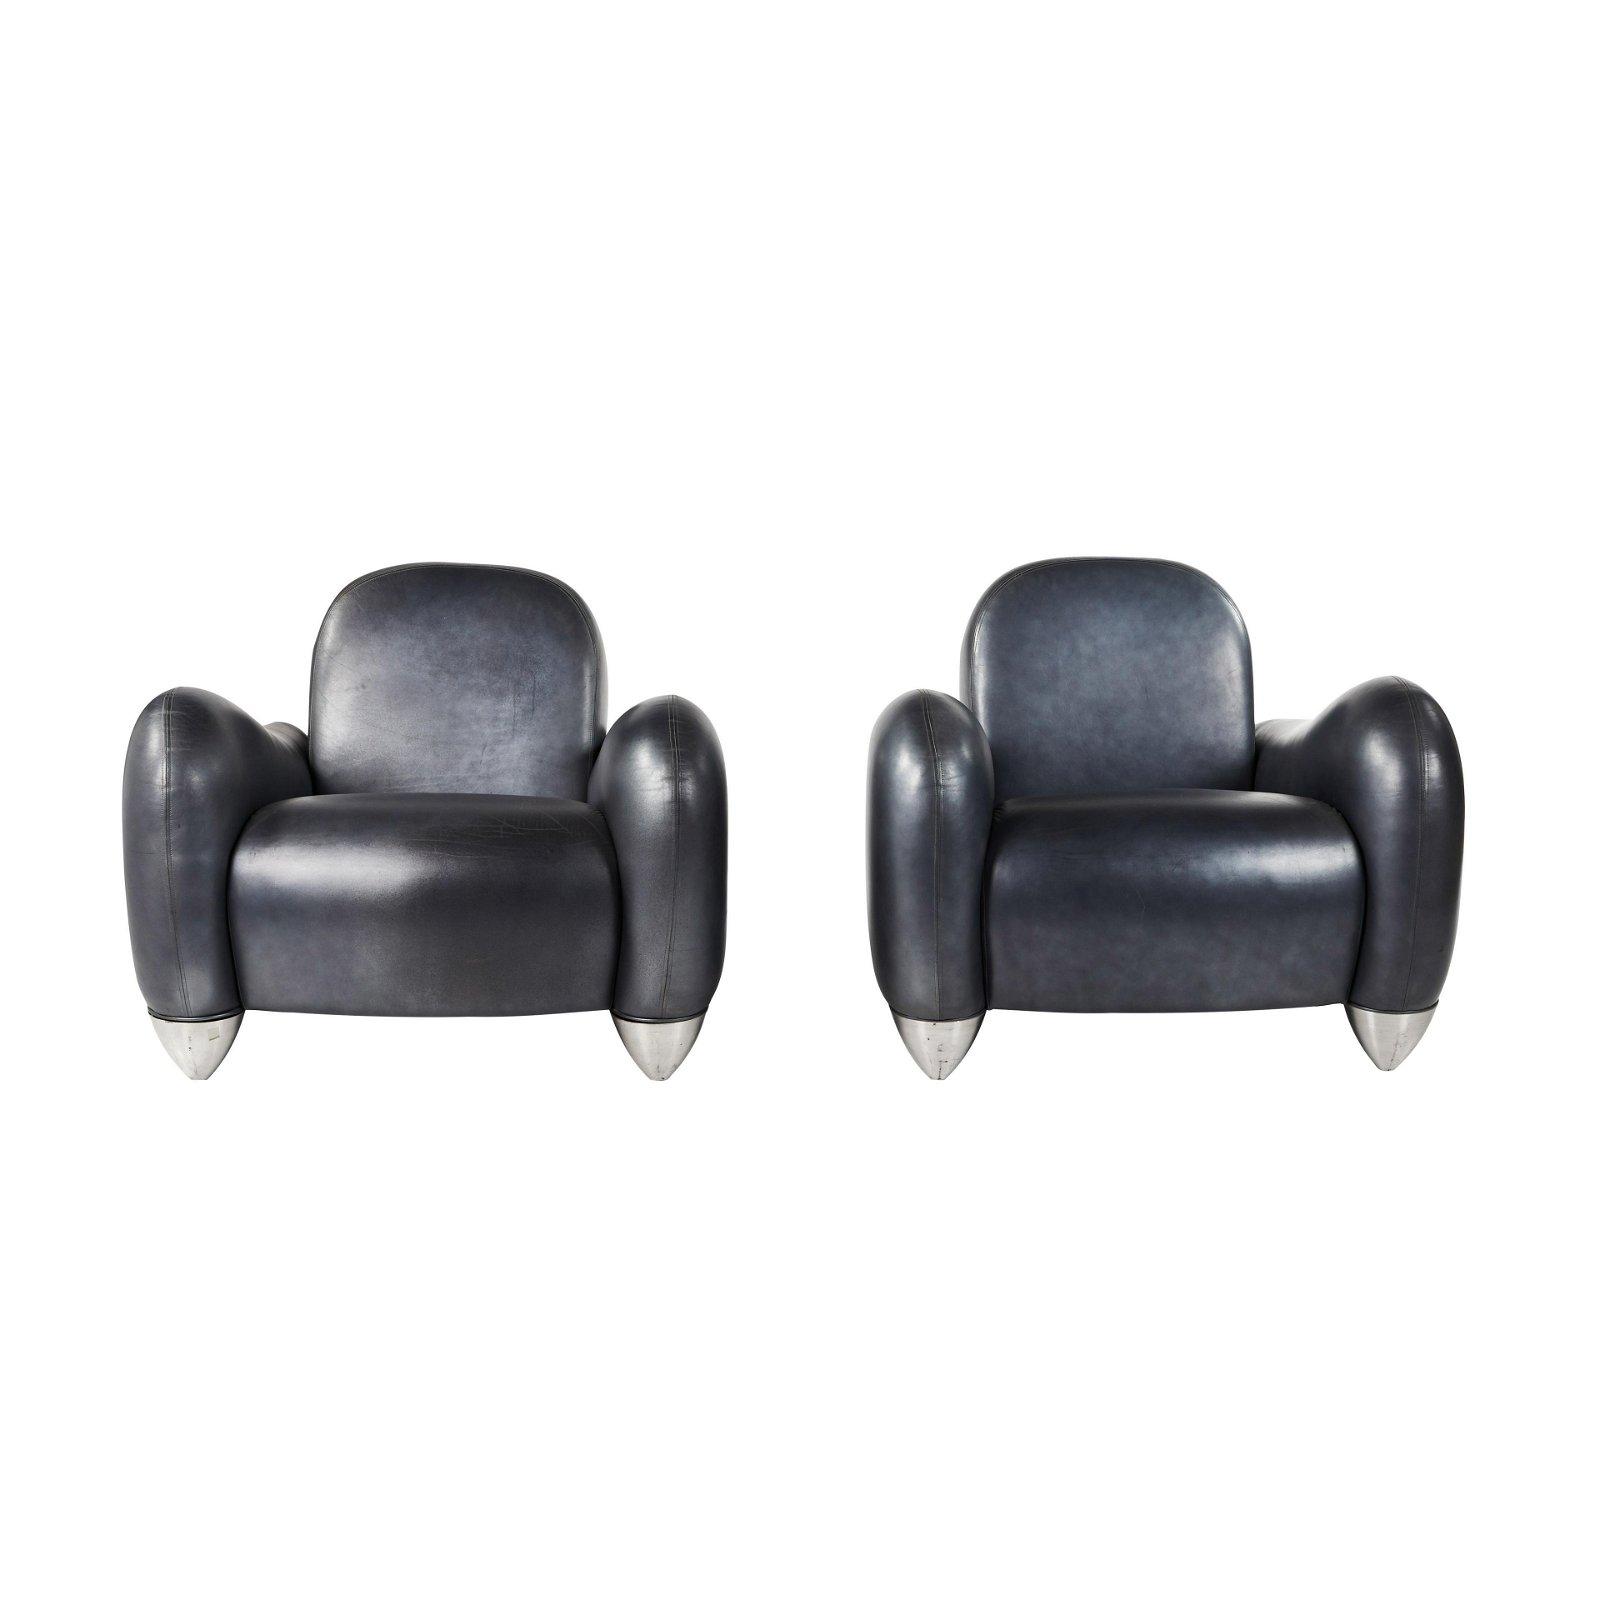 Design America Lounge Chairs (2)